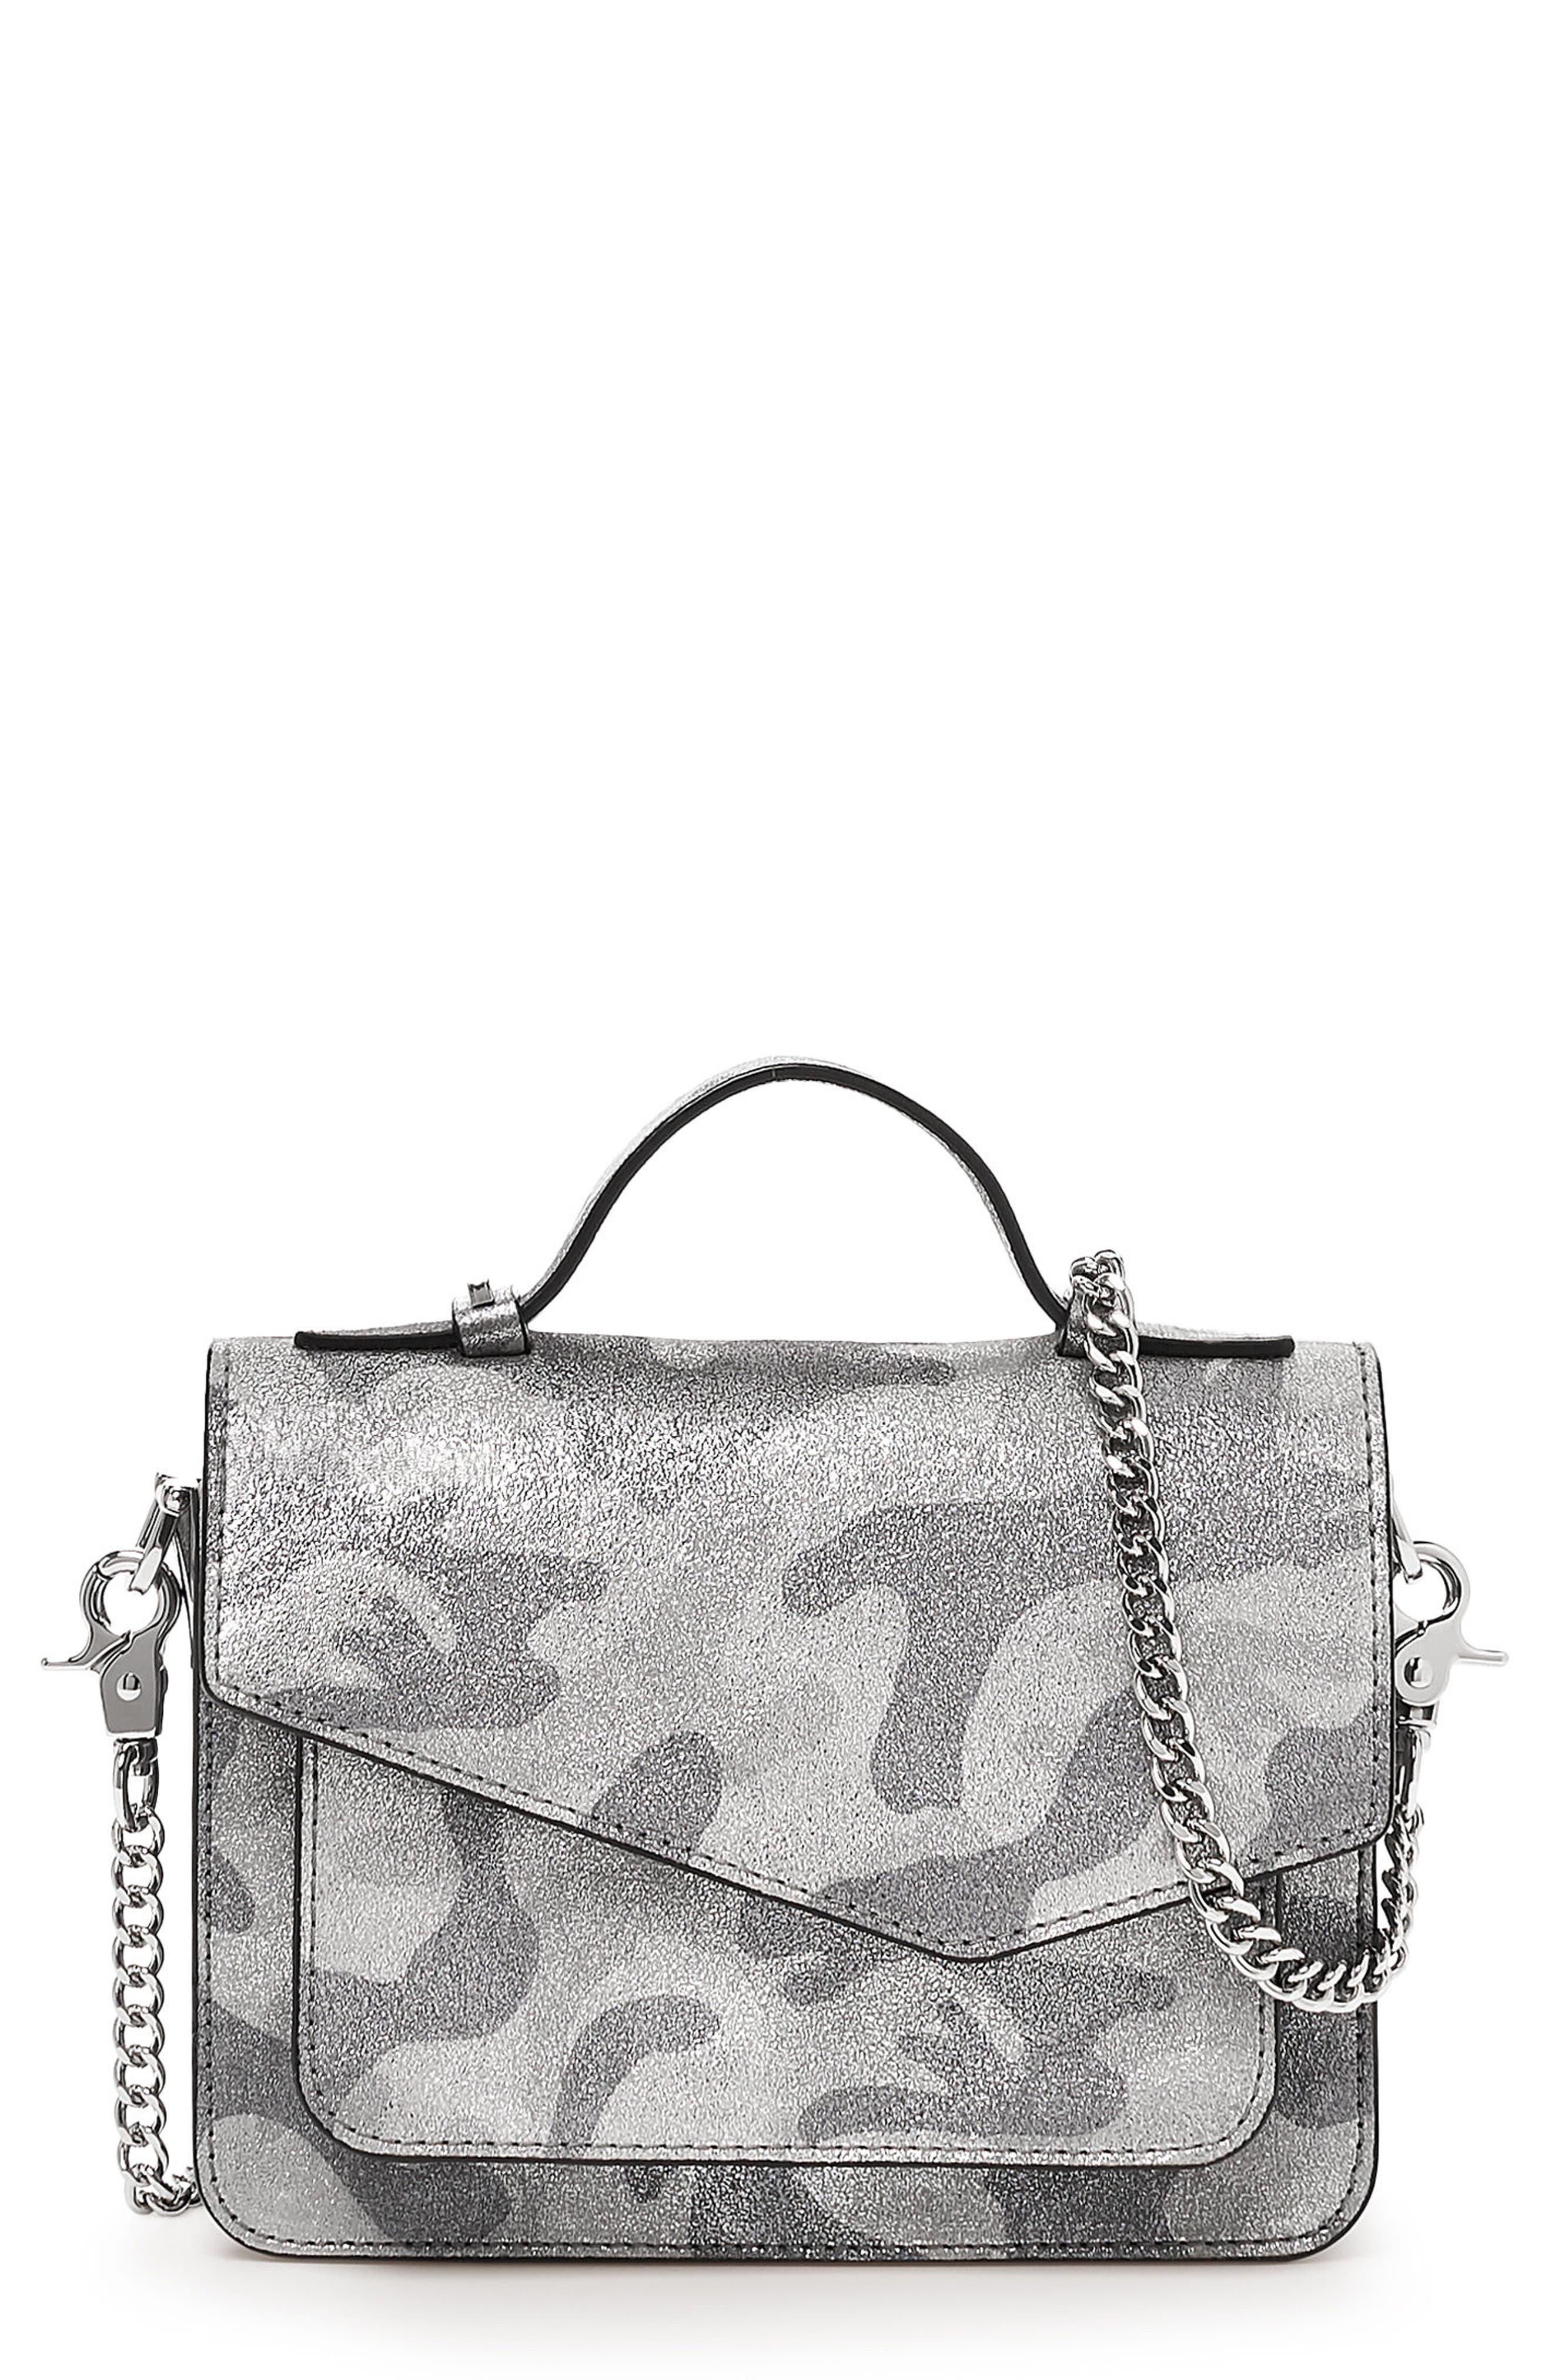 Mini Cobble Hill Calfskin Leather Crossbody Bag,                             Main thumbnail 1, color,                             SILVER CAMO